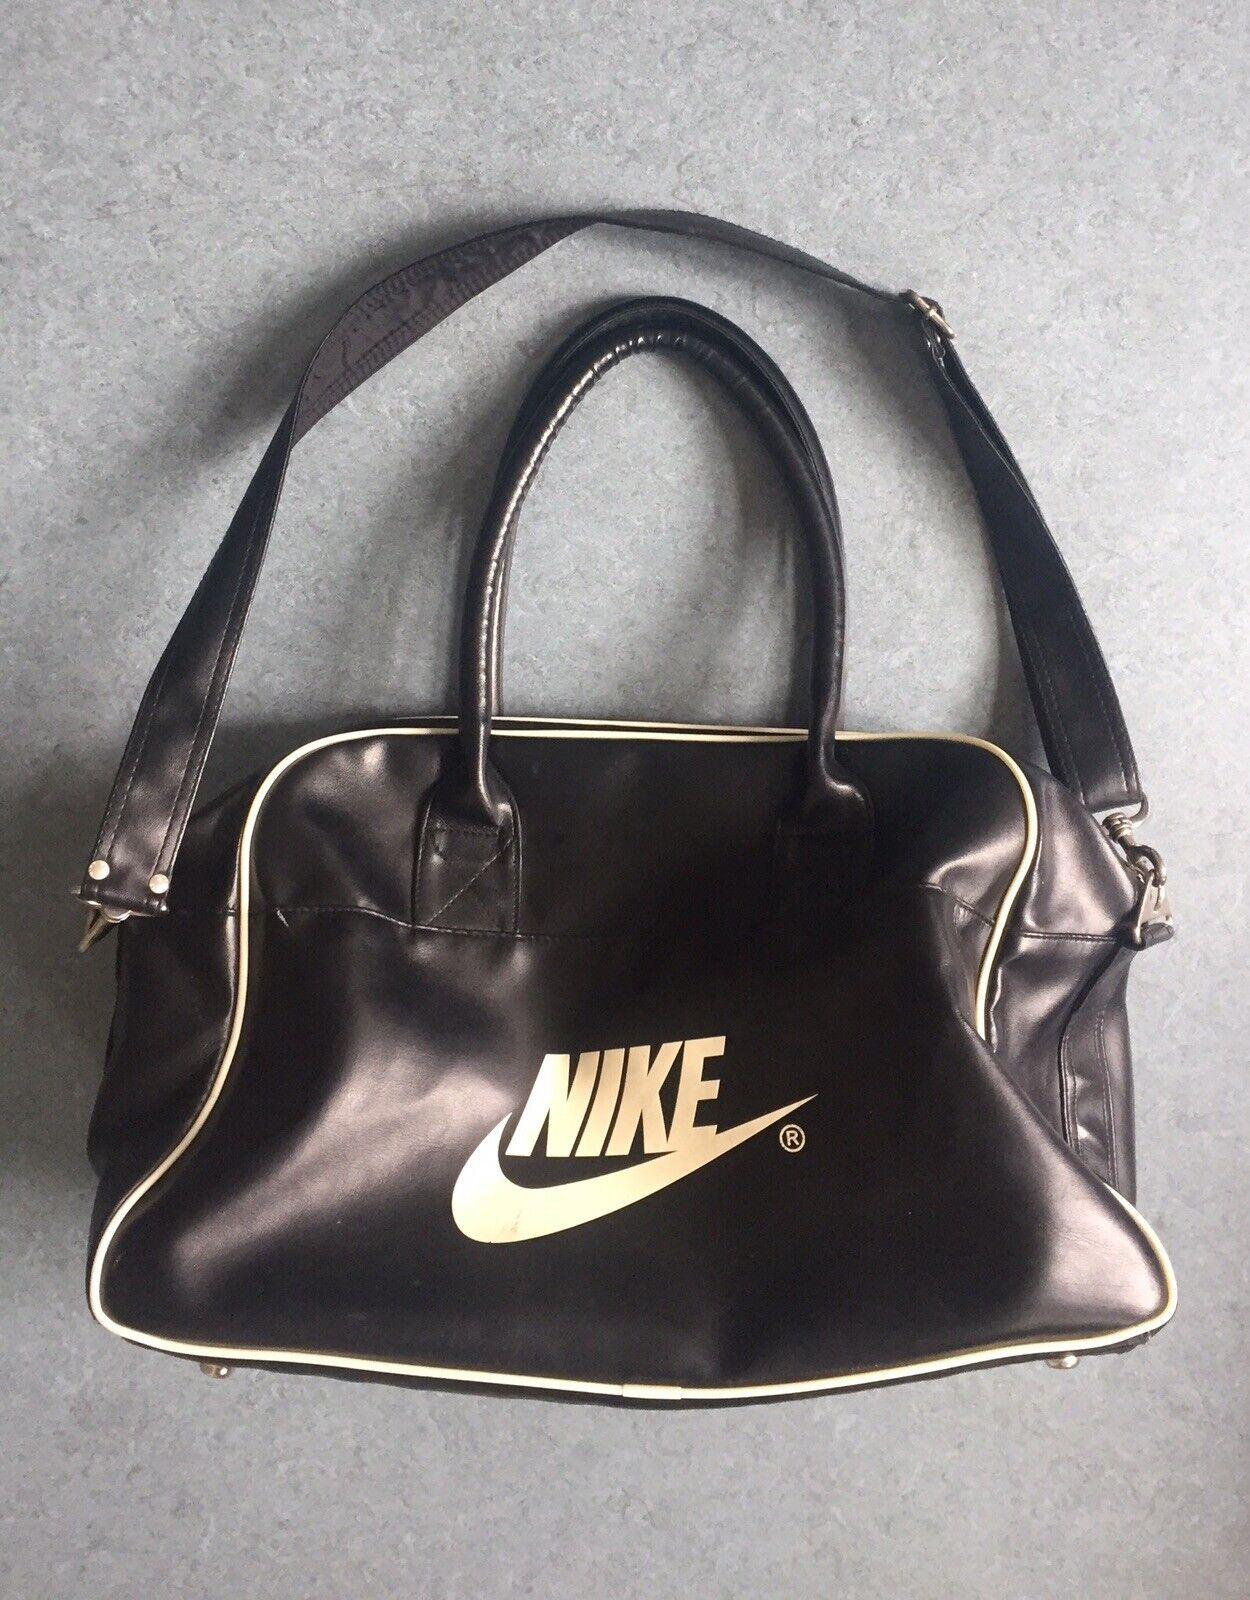 Nike vintage bolso bolso de mano bolsa de deporte negros